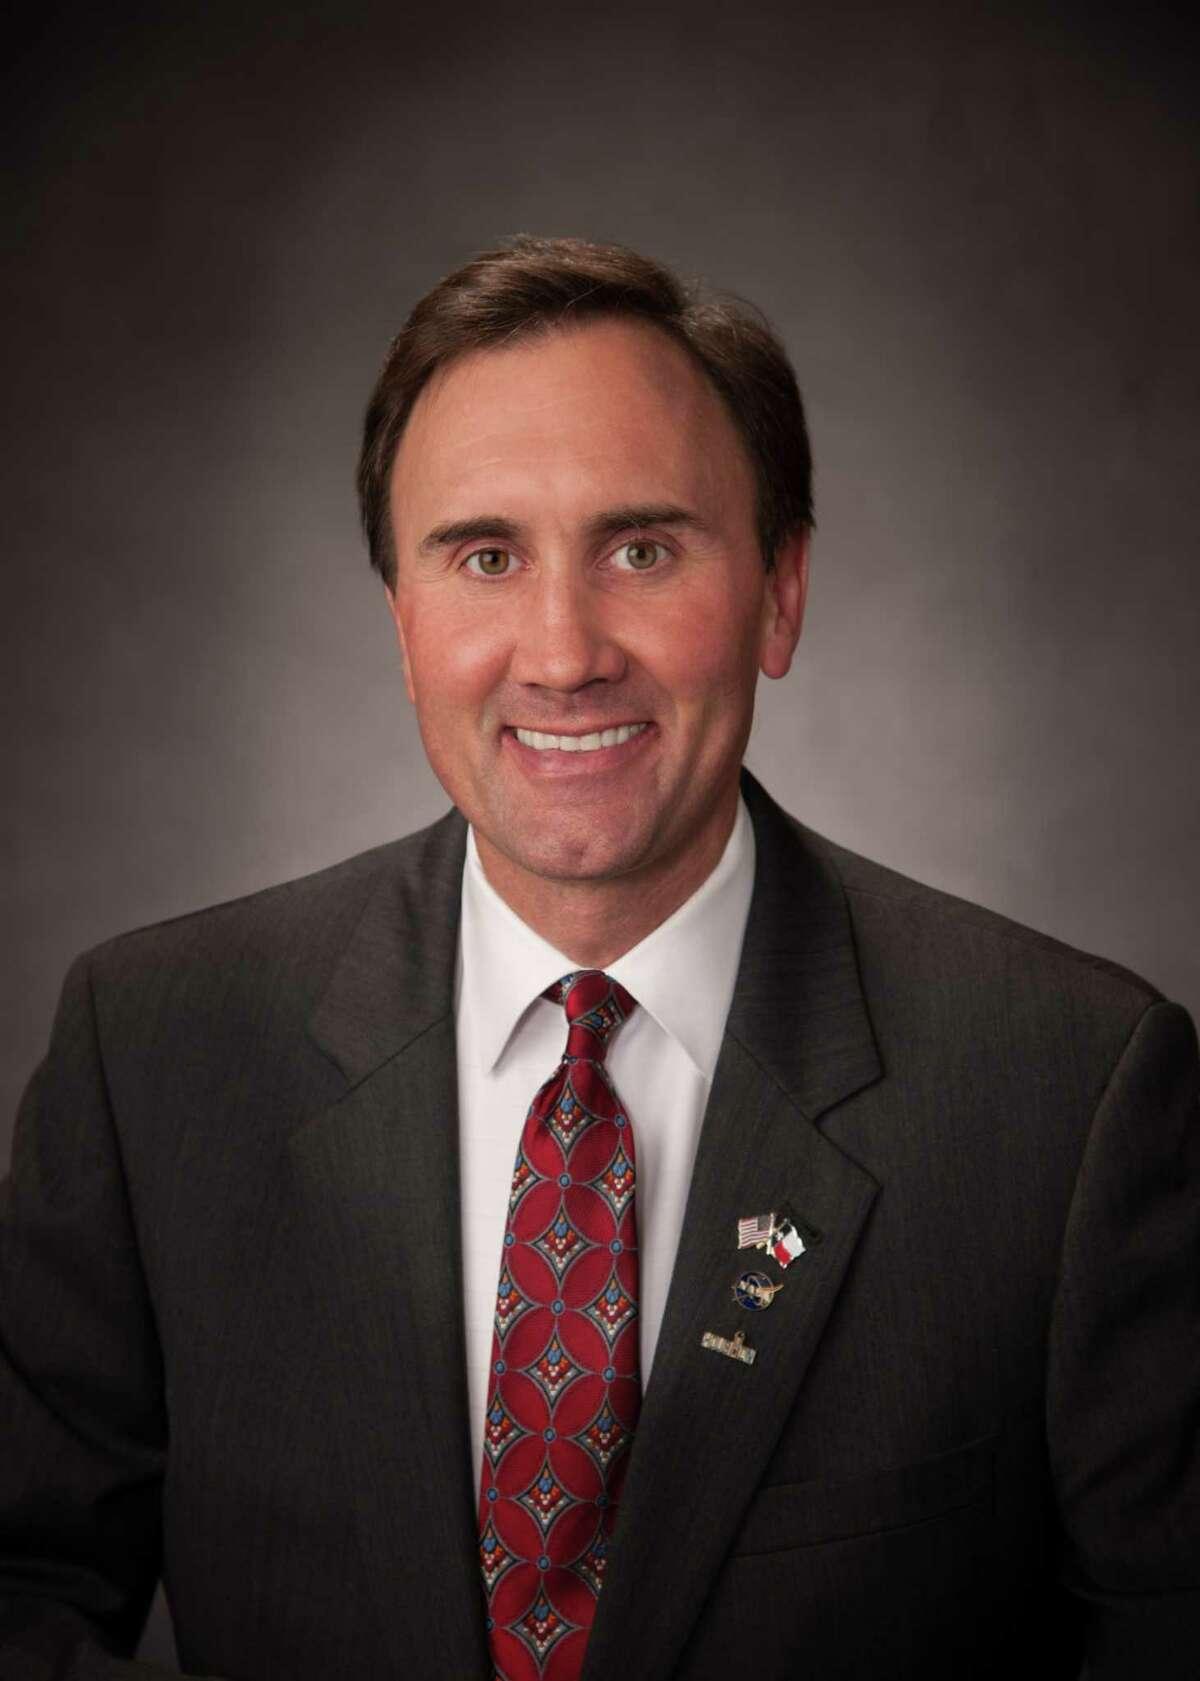 U.S. Rep. Pete Olson